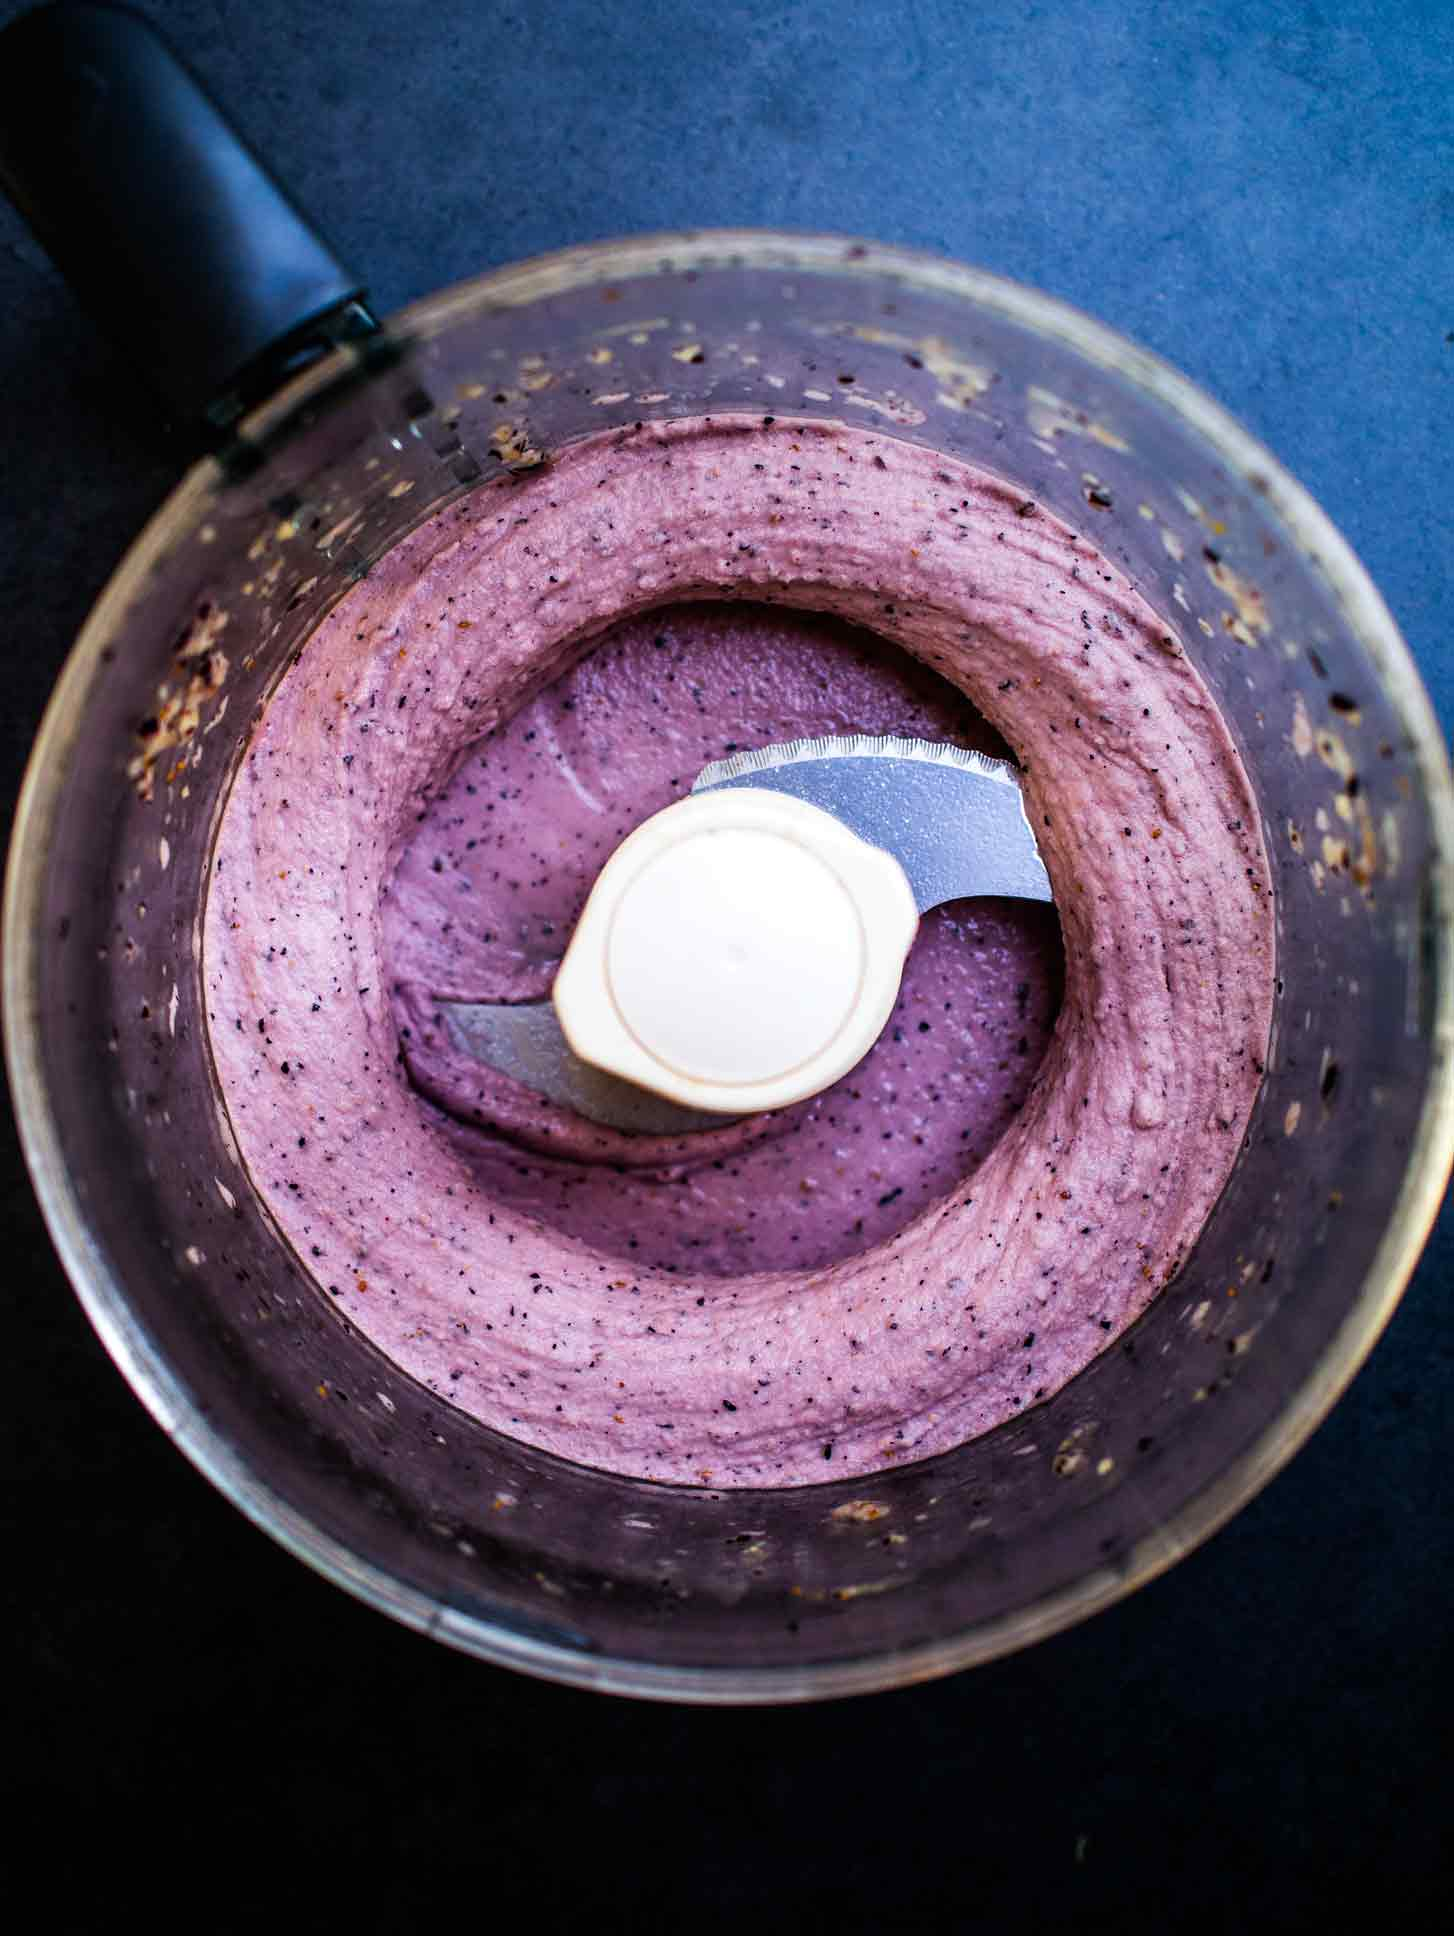 Simple 3-ingredient Blueberry & Banana Smoothie Bowl! #recipe #vegan #vegan #berry #breakfast #easy #healthy